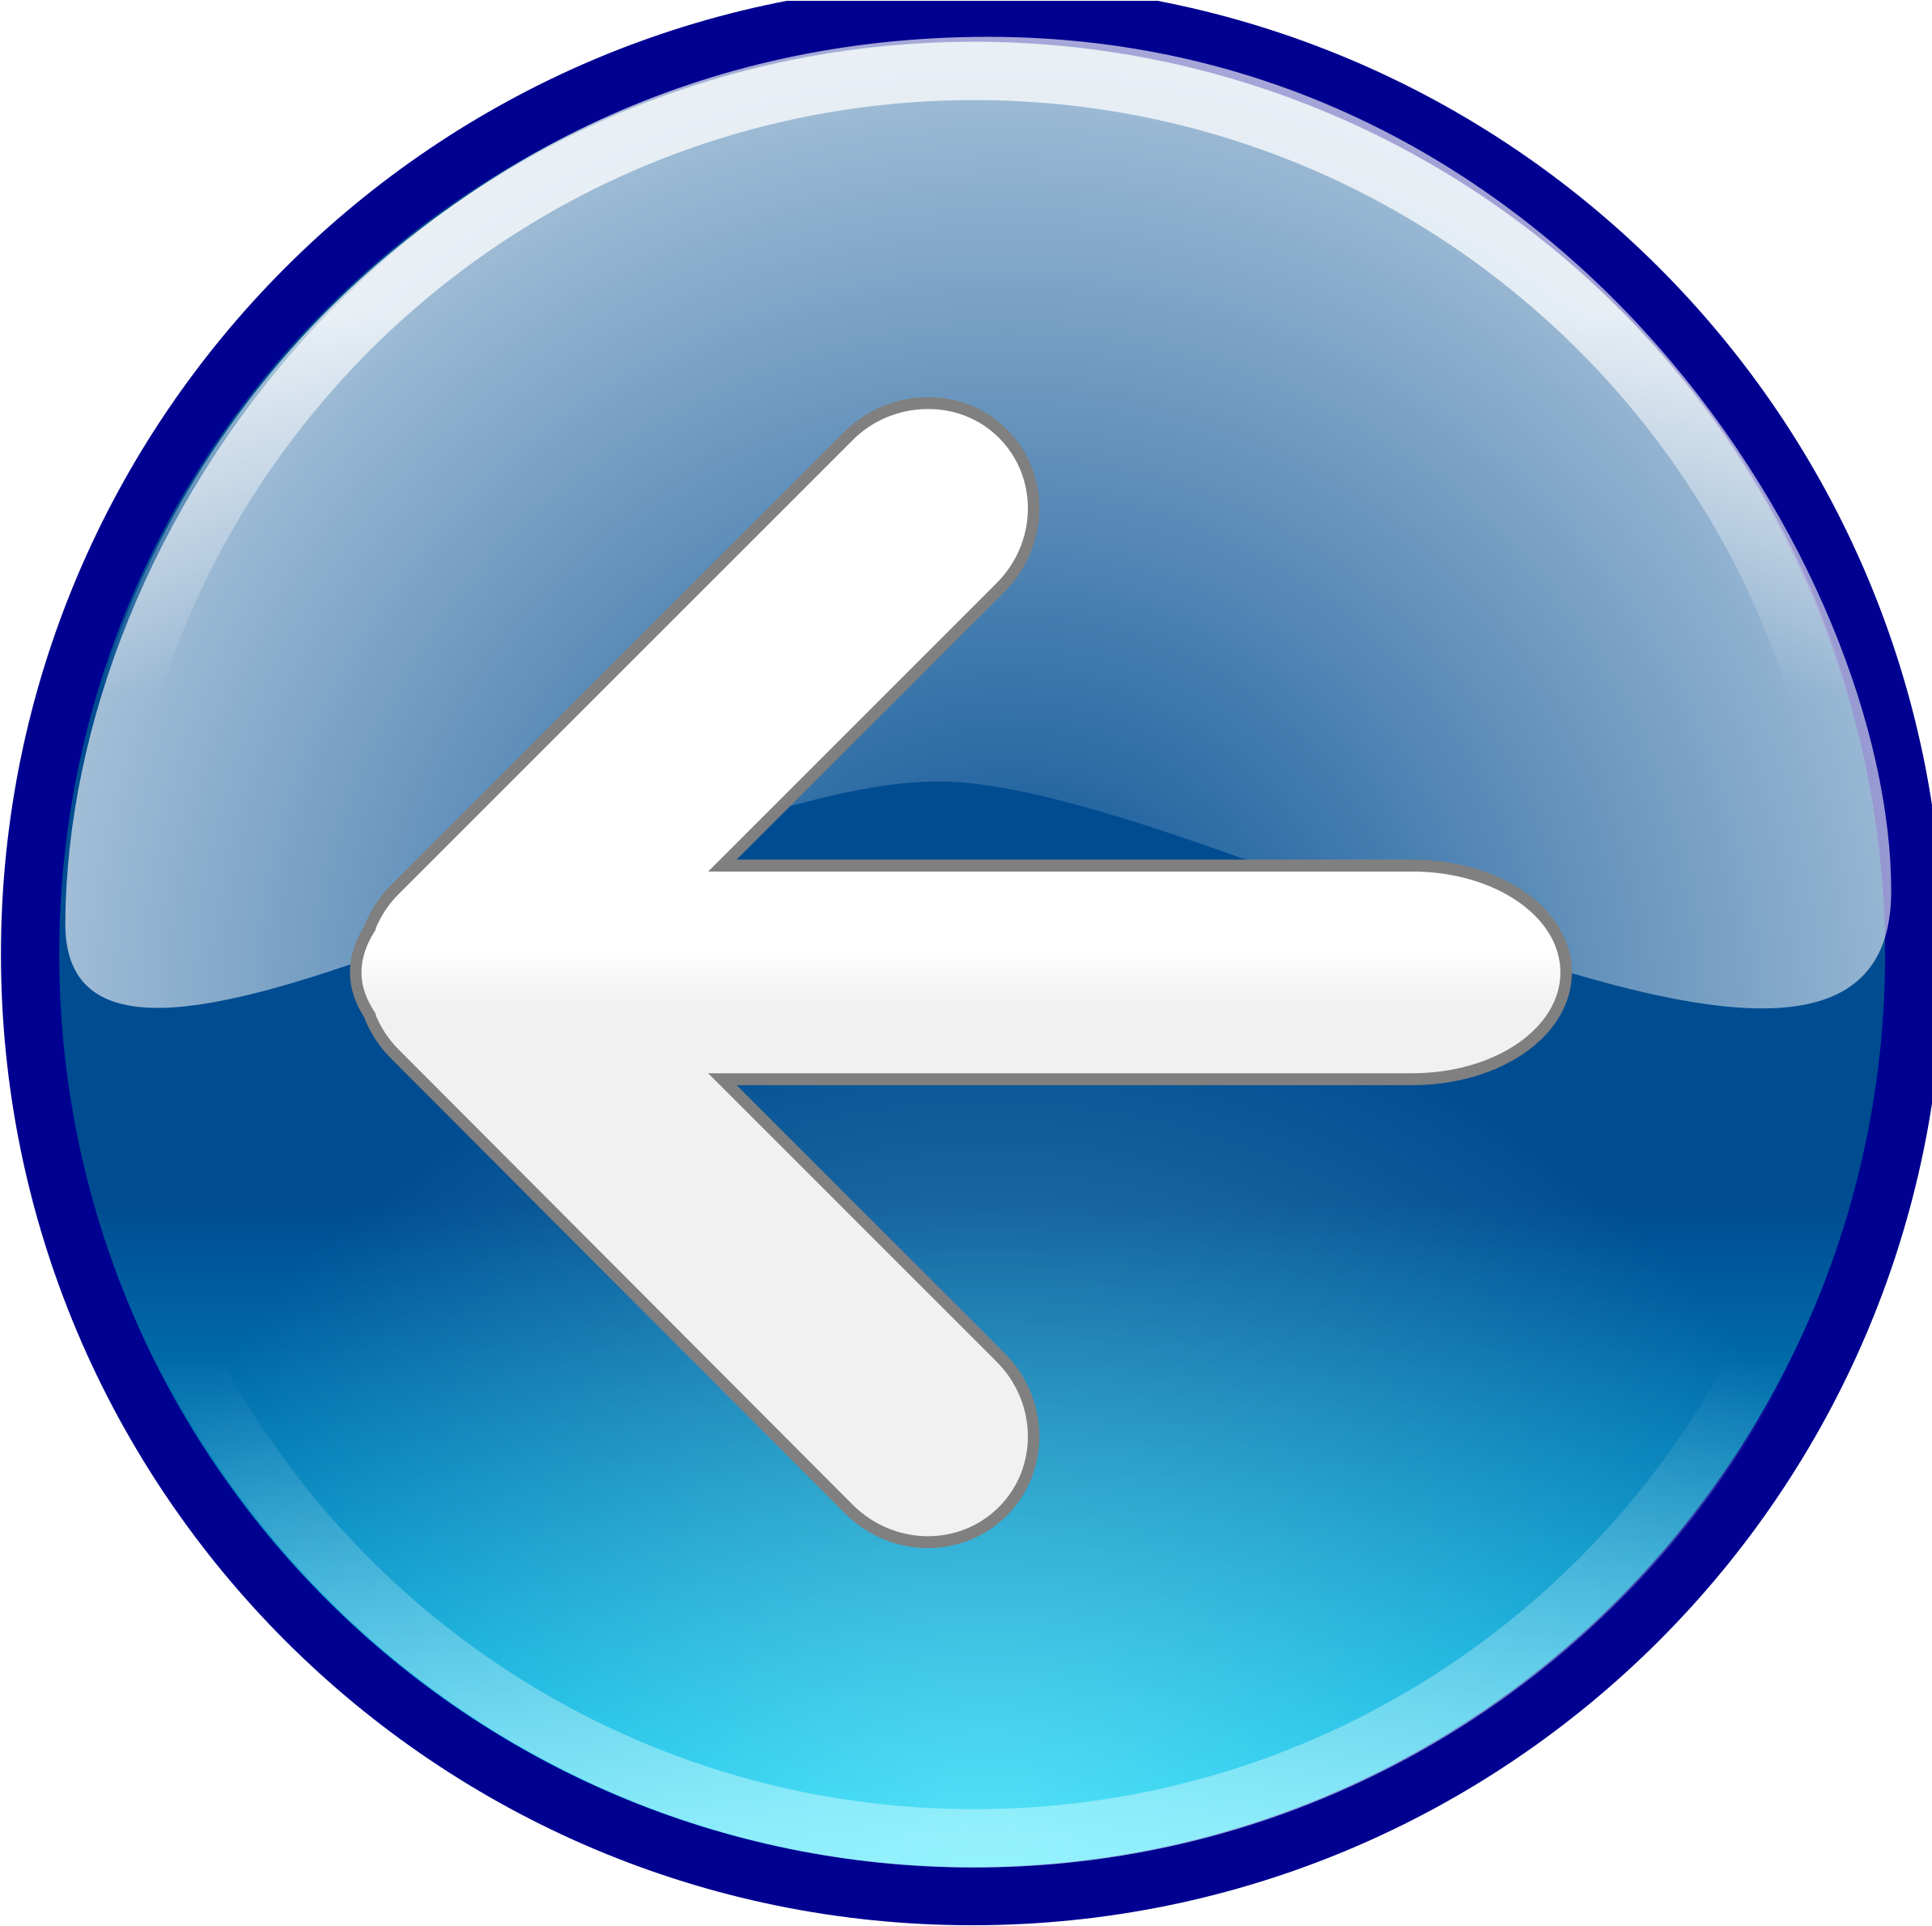 Clip Art Button.